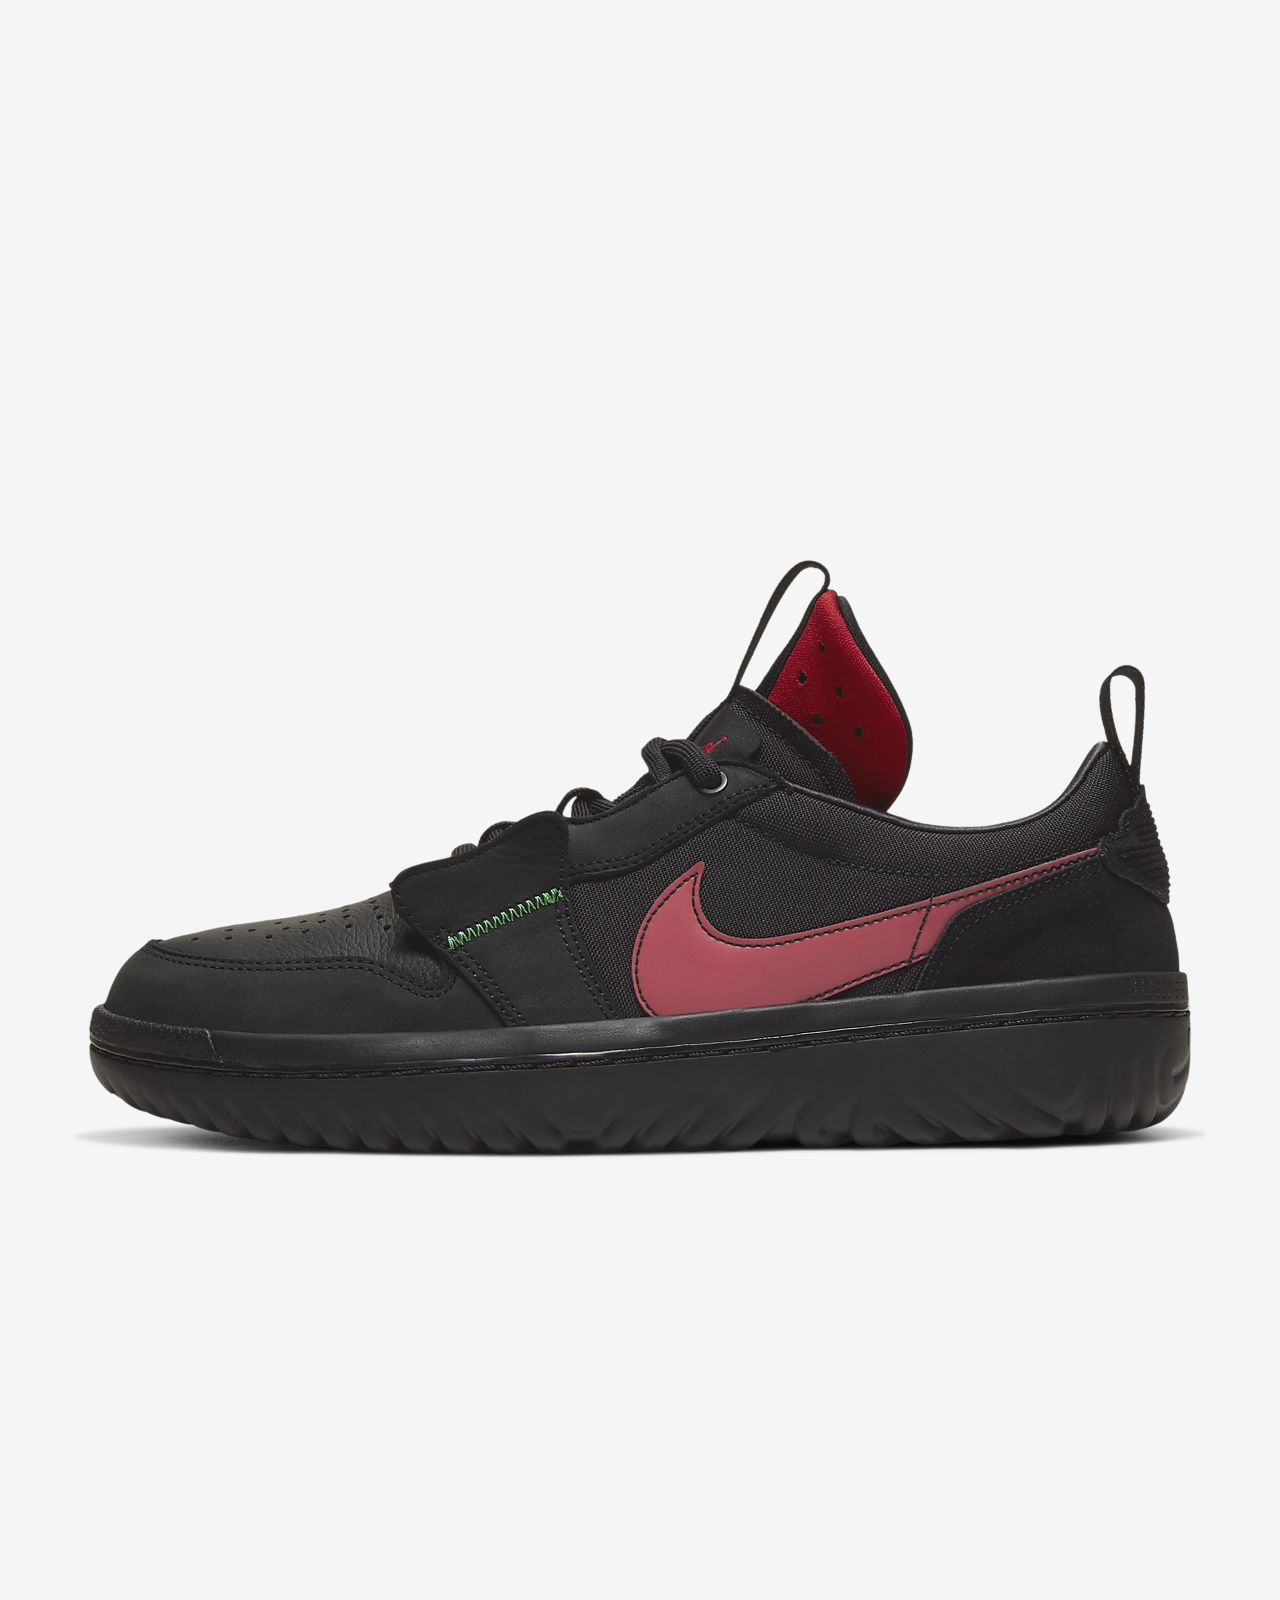 Jordan 1 Low React Fearless Shoe